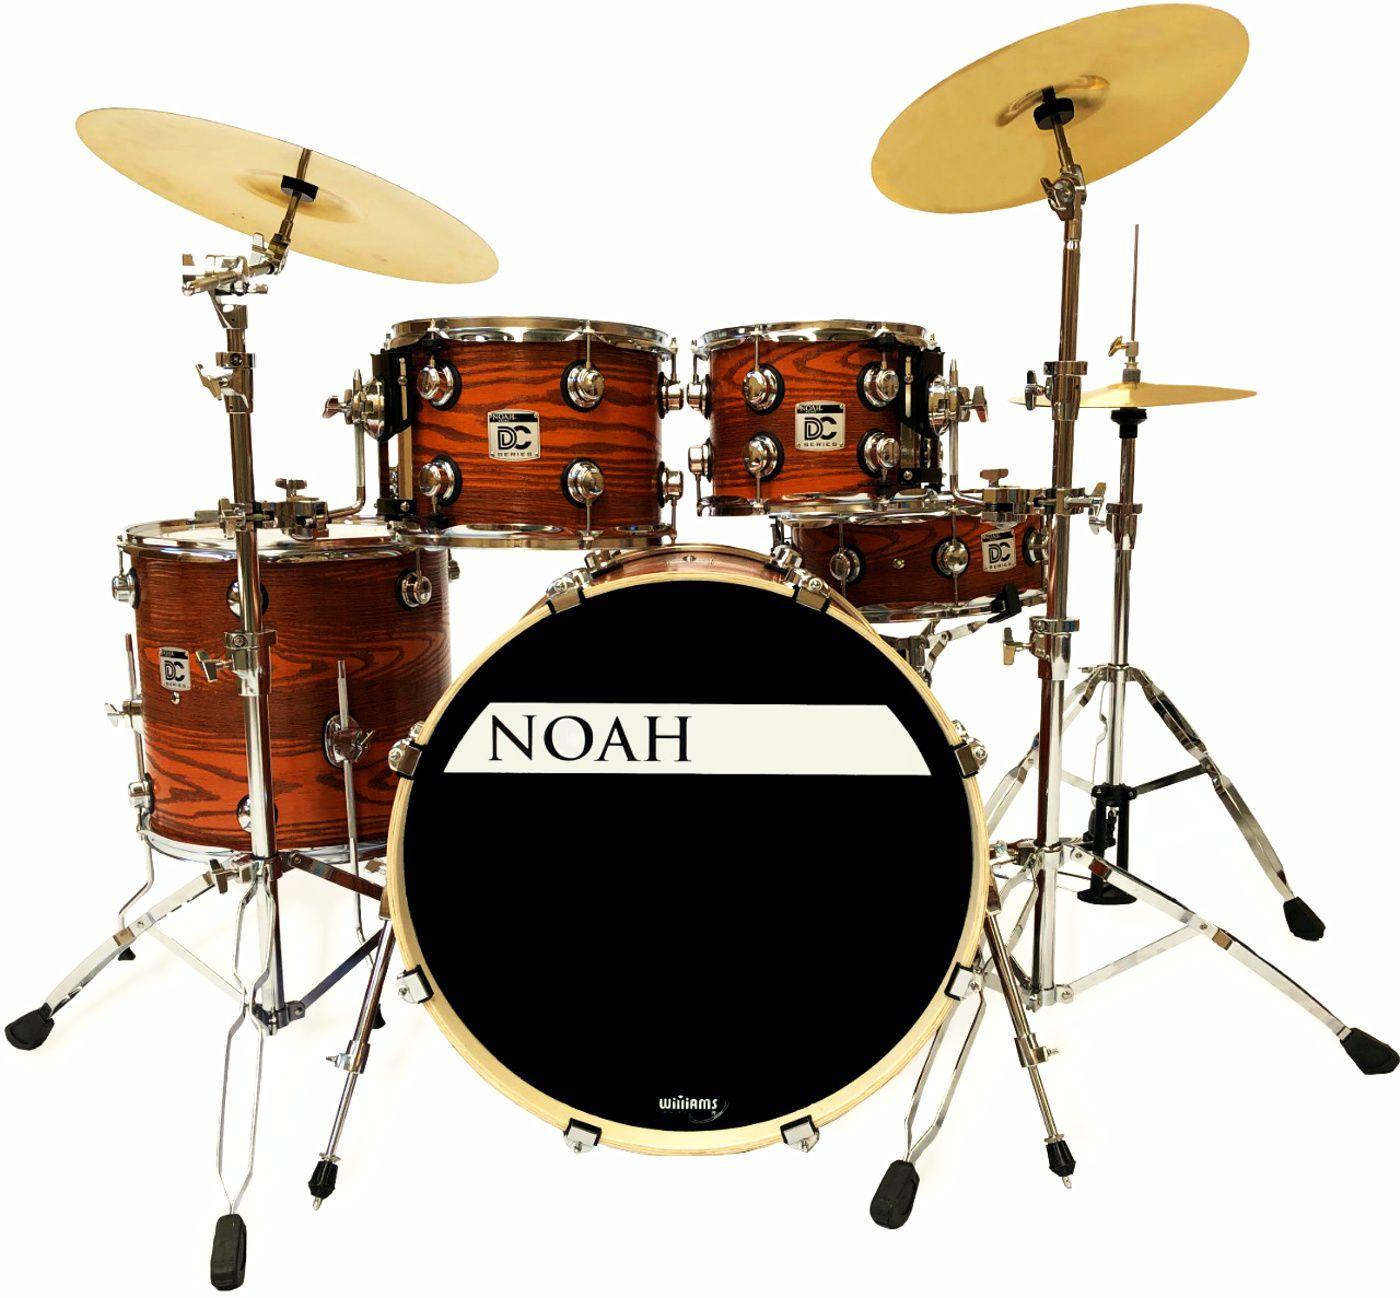 Bateria Acústica Noah Dc5 Bumbo 22 Completa Red Cedar